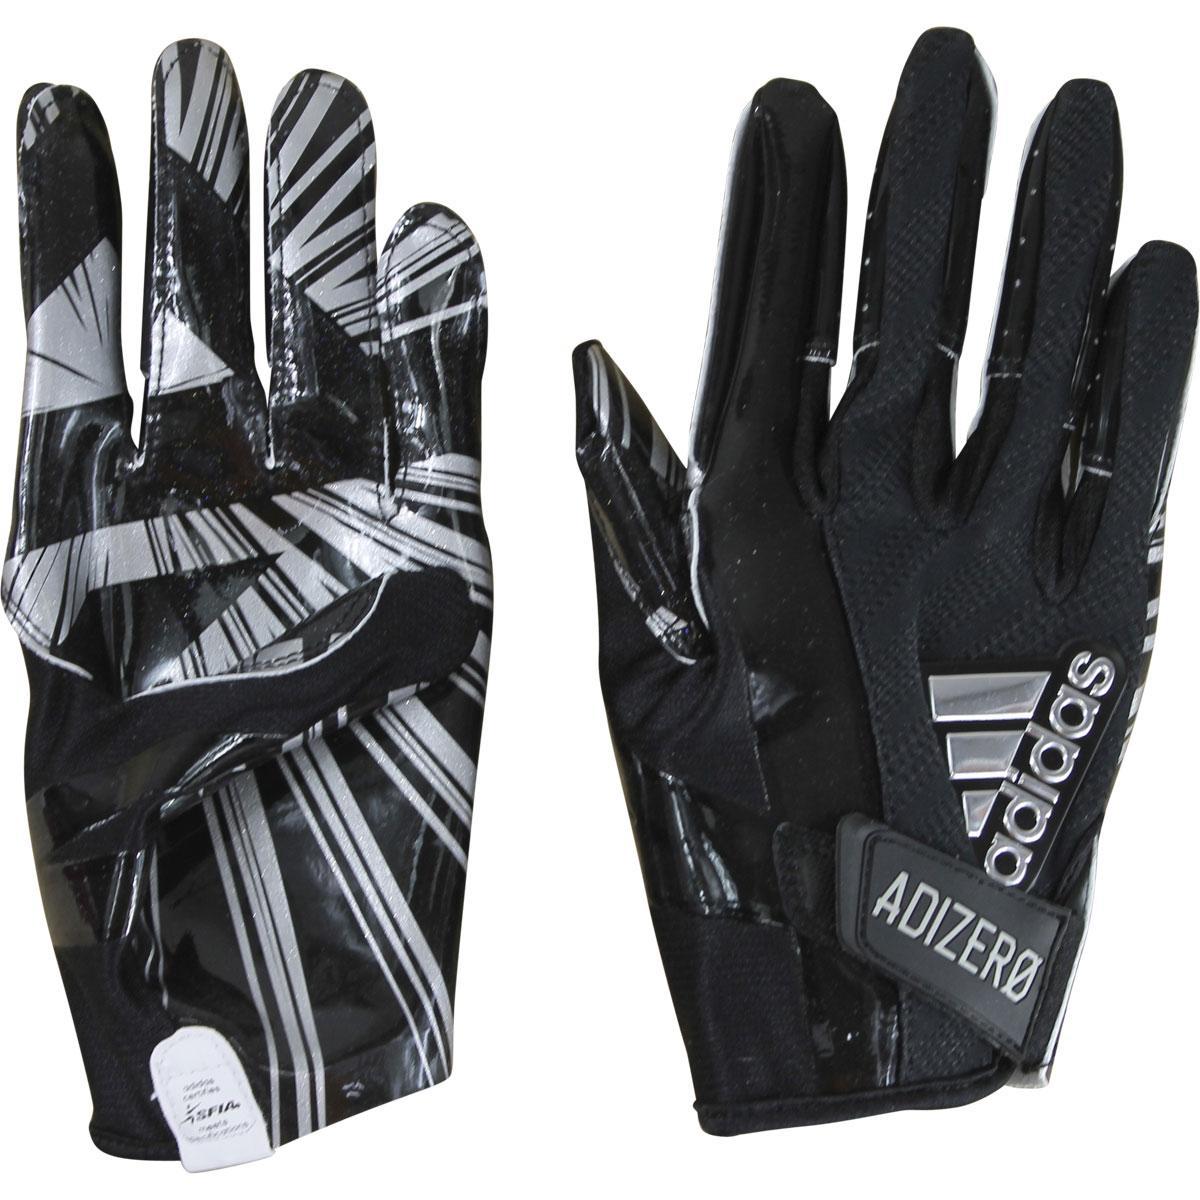 Adizero 5-Star 6.0 Receiver Football Gloves